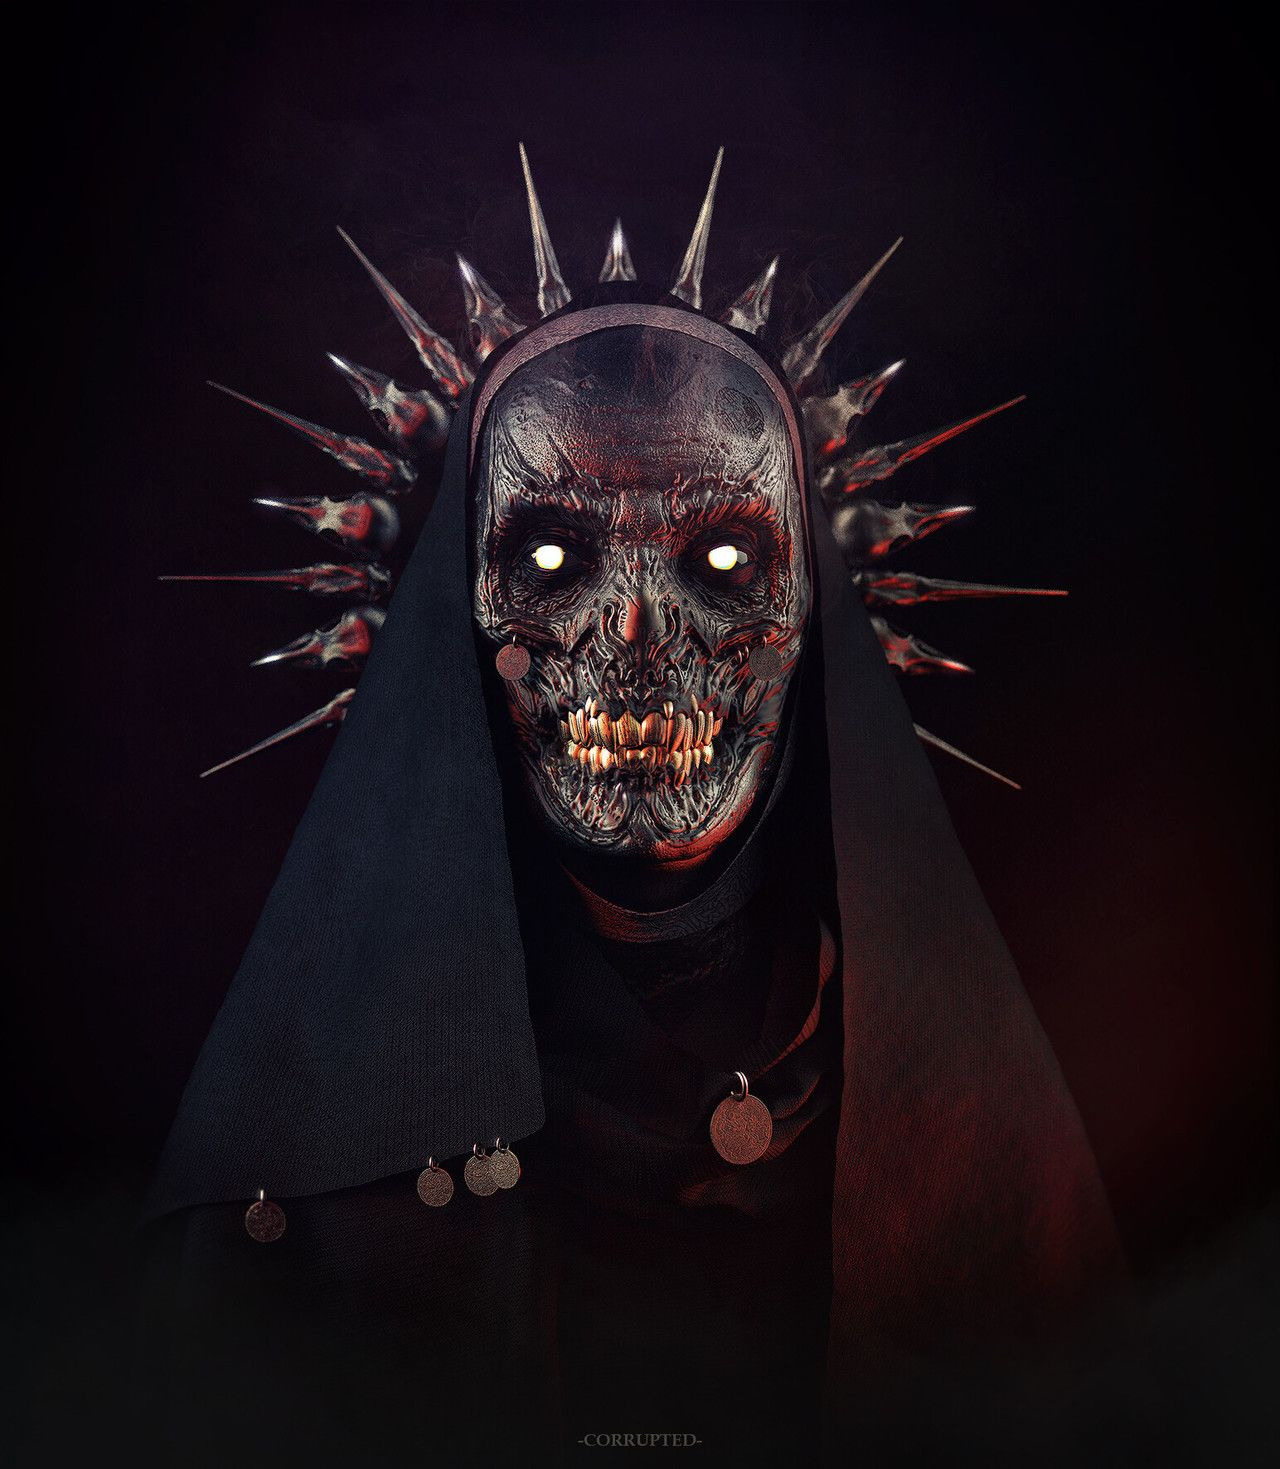 evil stuff image by Darren Hutcherson Masks art, Macabre